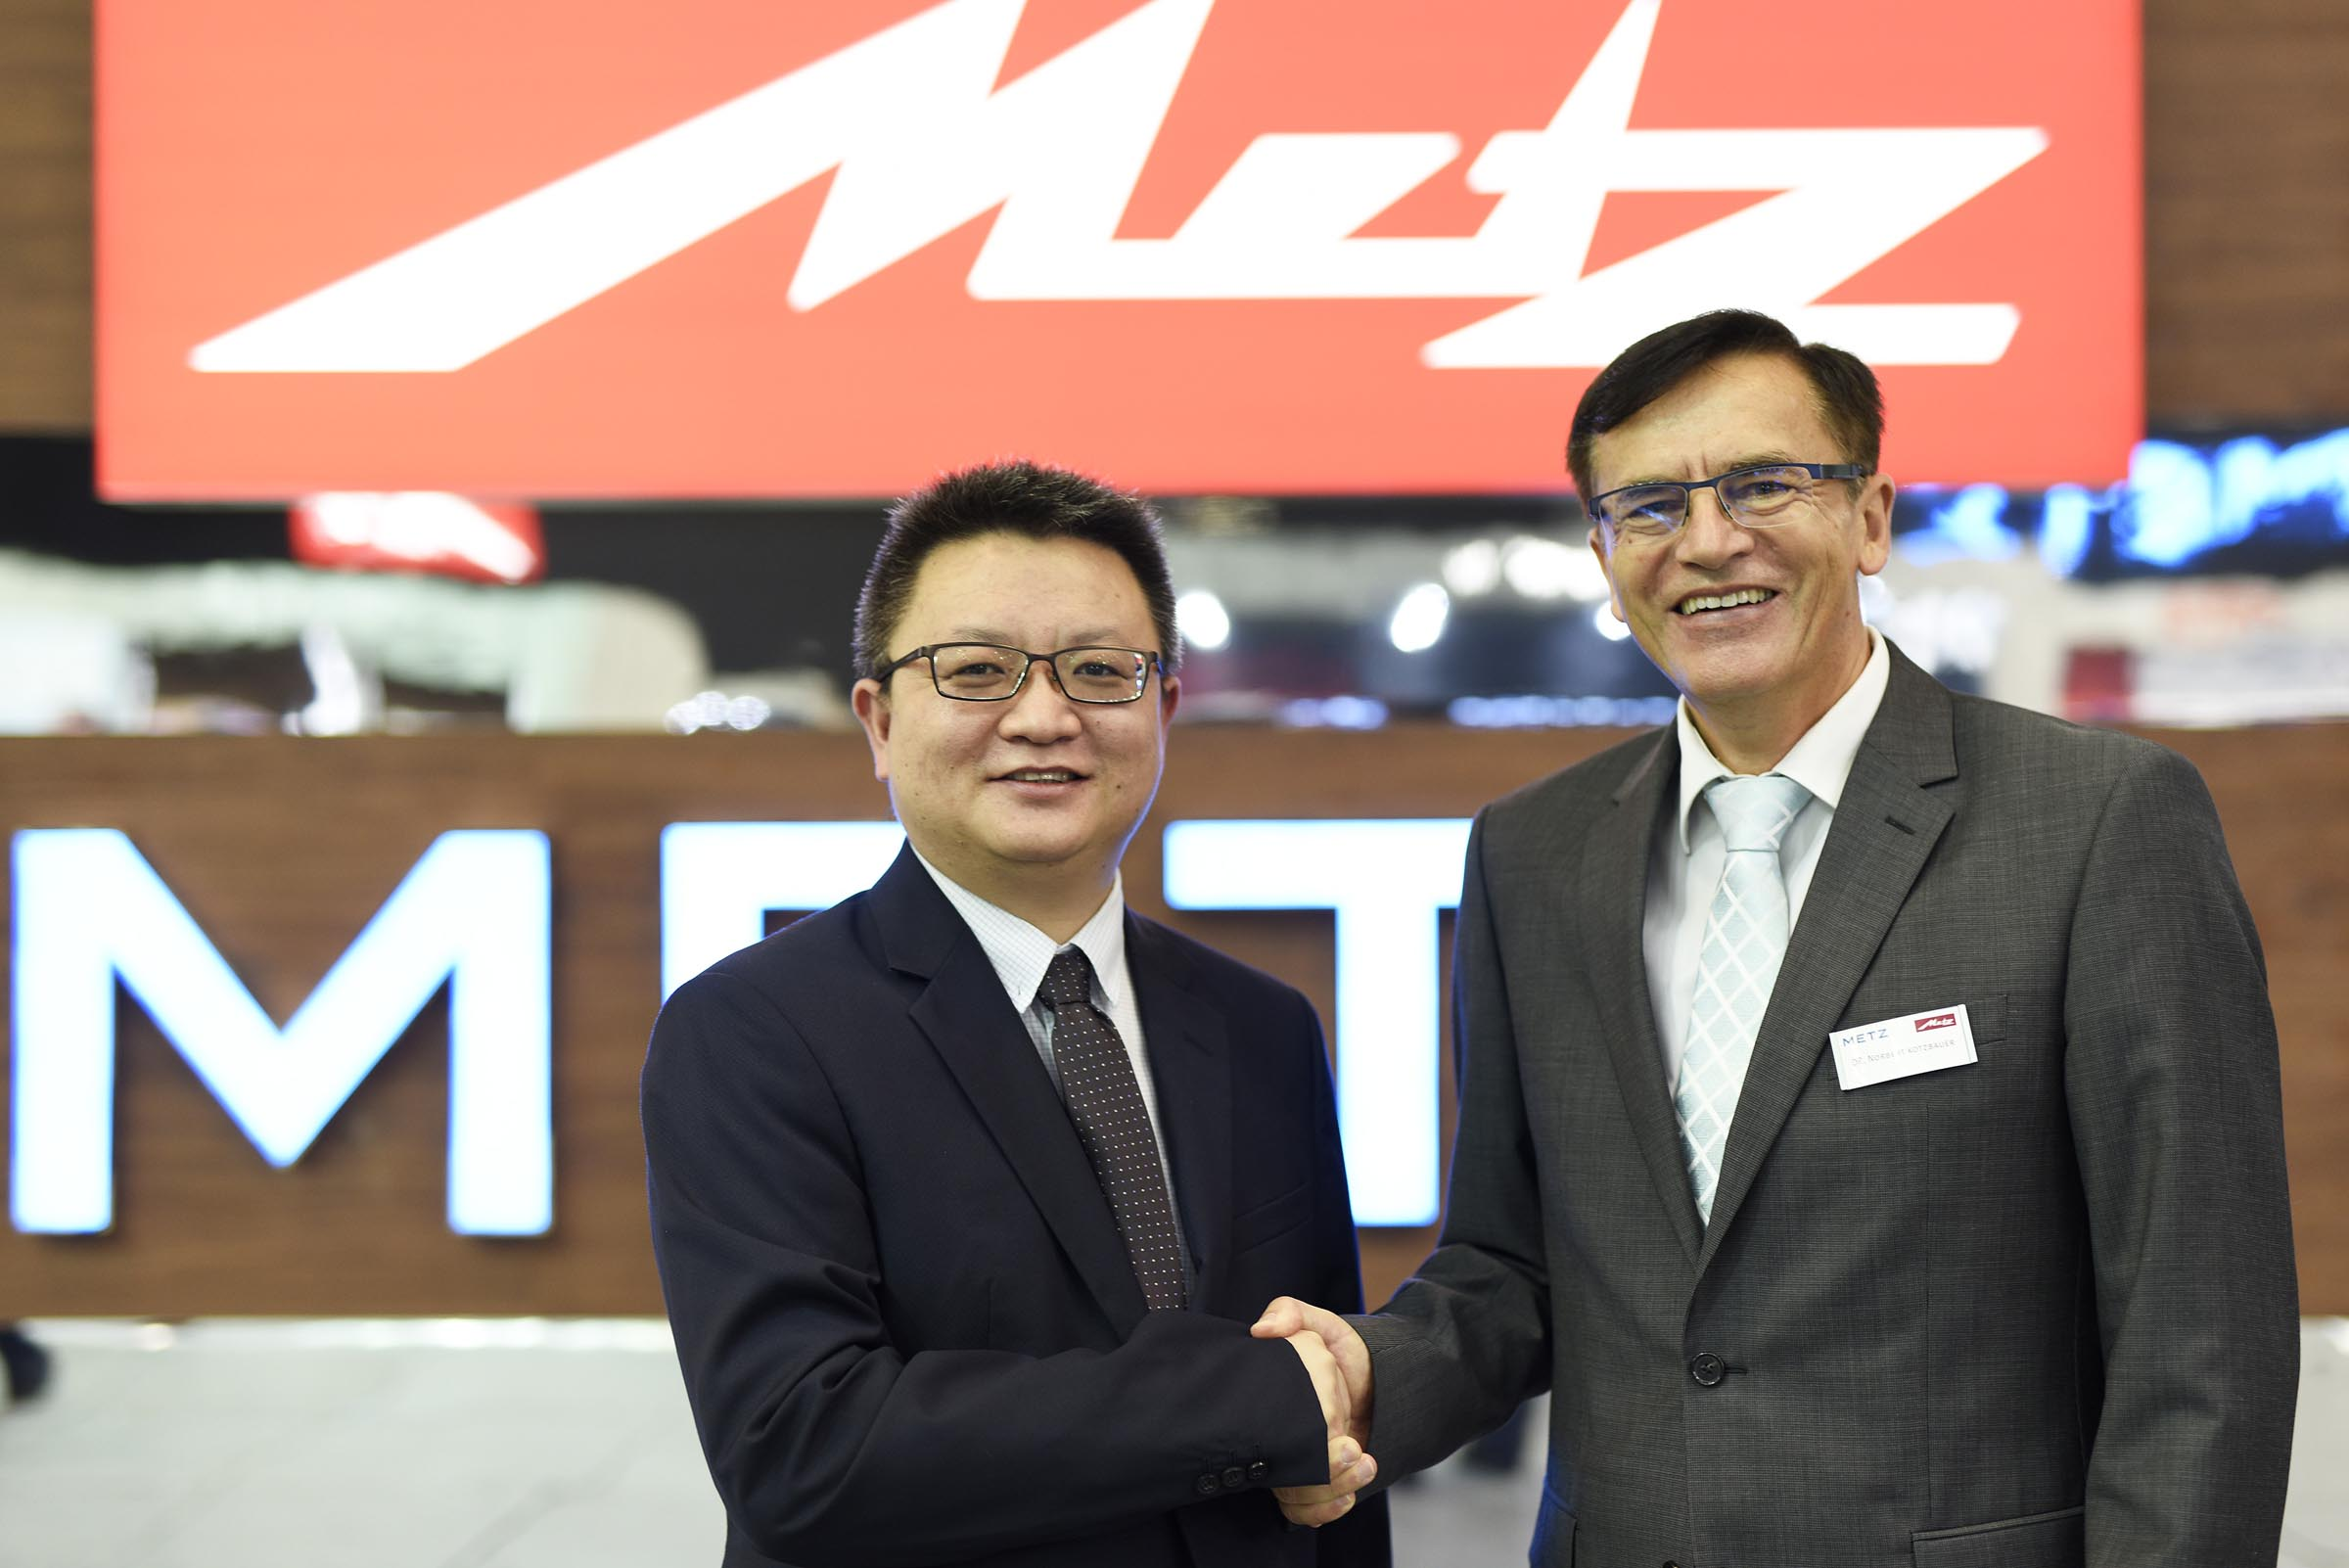 Skyworth General Manager Johnny Wang und Metz Geschäftsführer Dr Norbert Kotzbauer